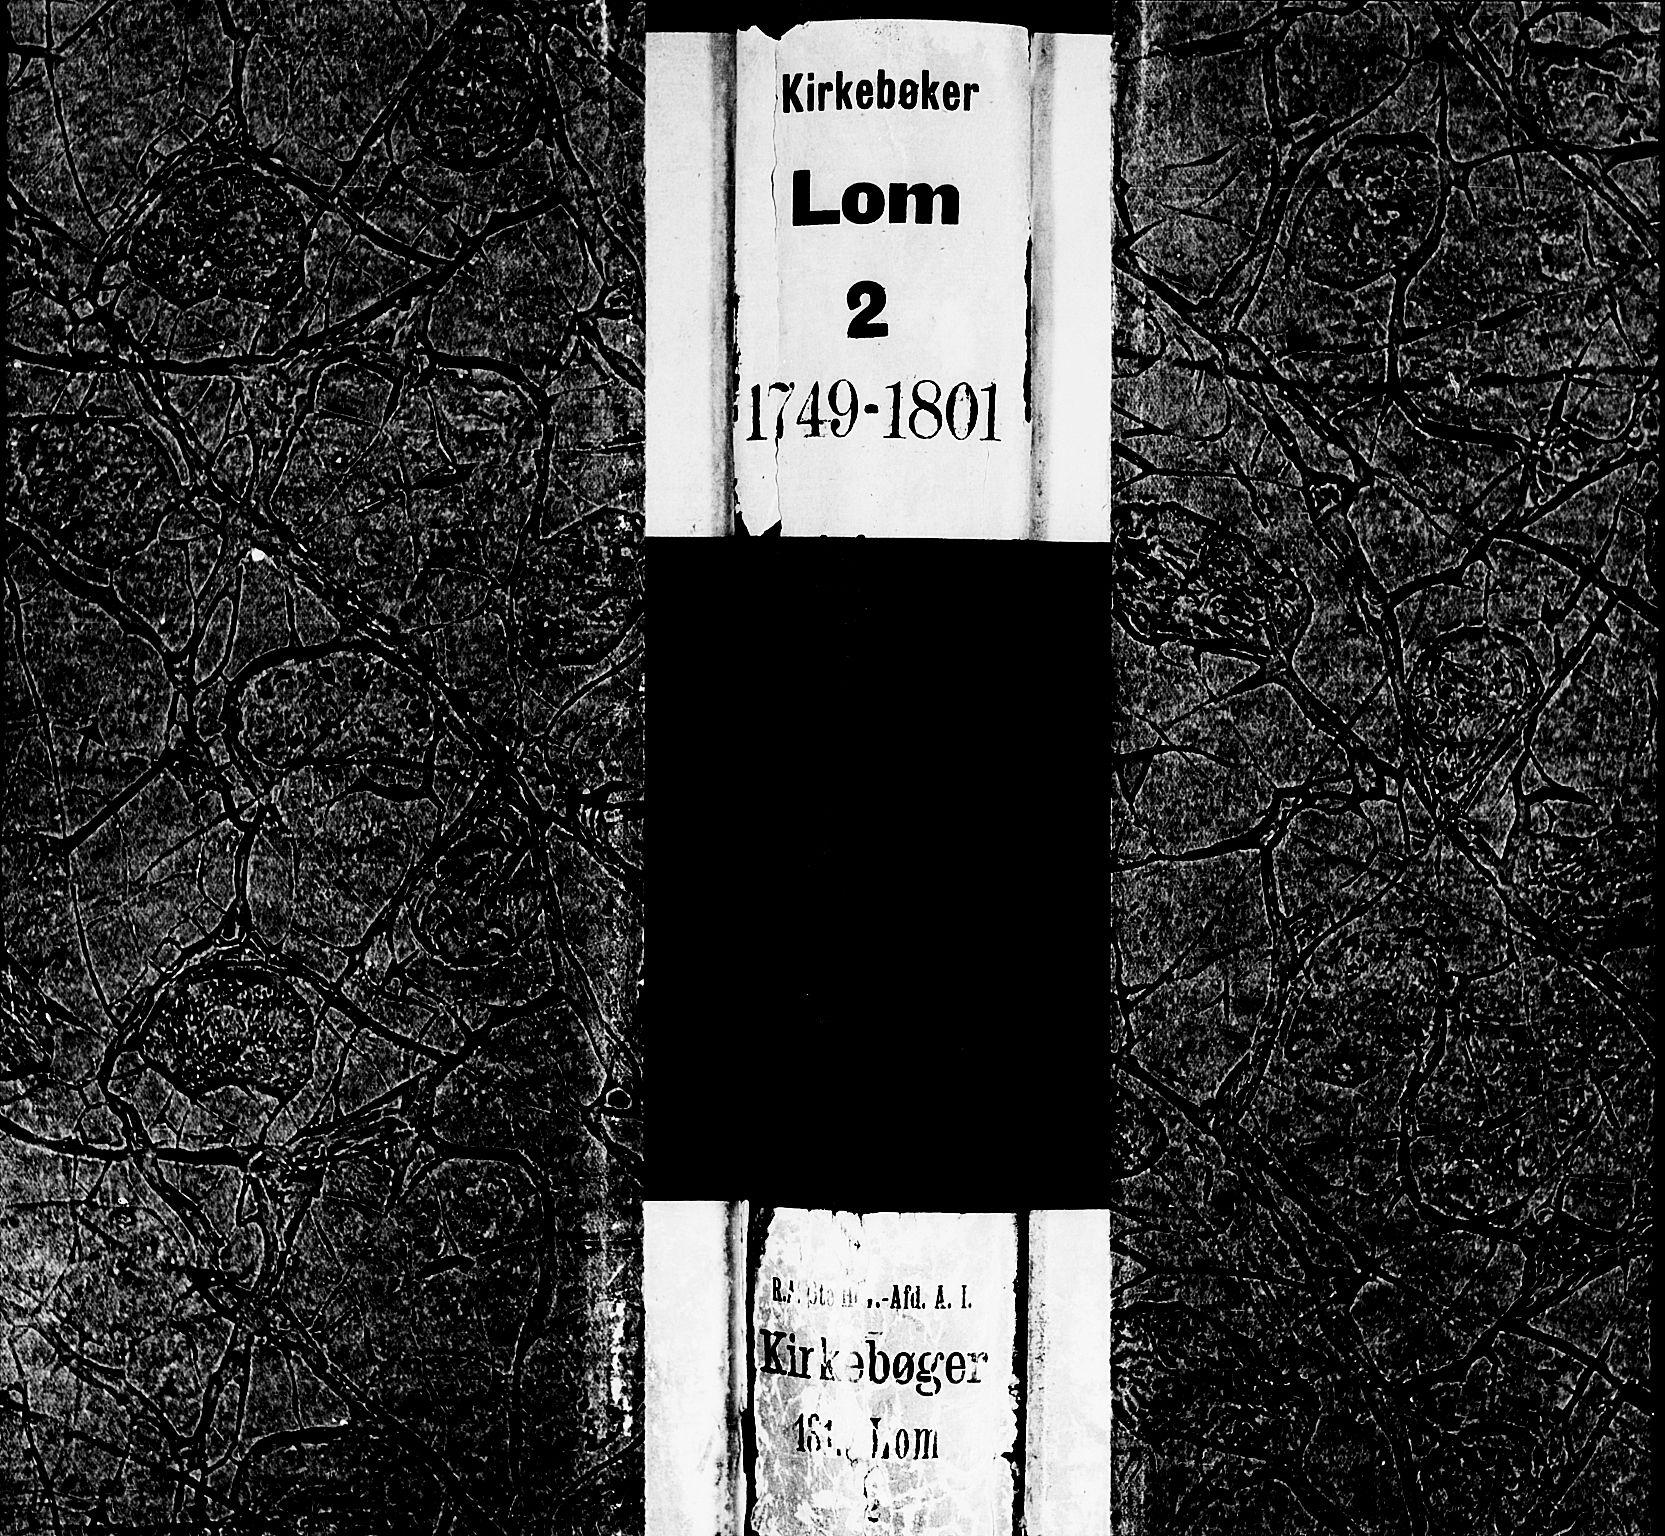 SAH, Lom prestekontor, K/L0002: Ministerialbok nr. 2, 1749-1801